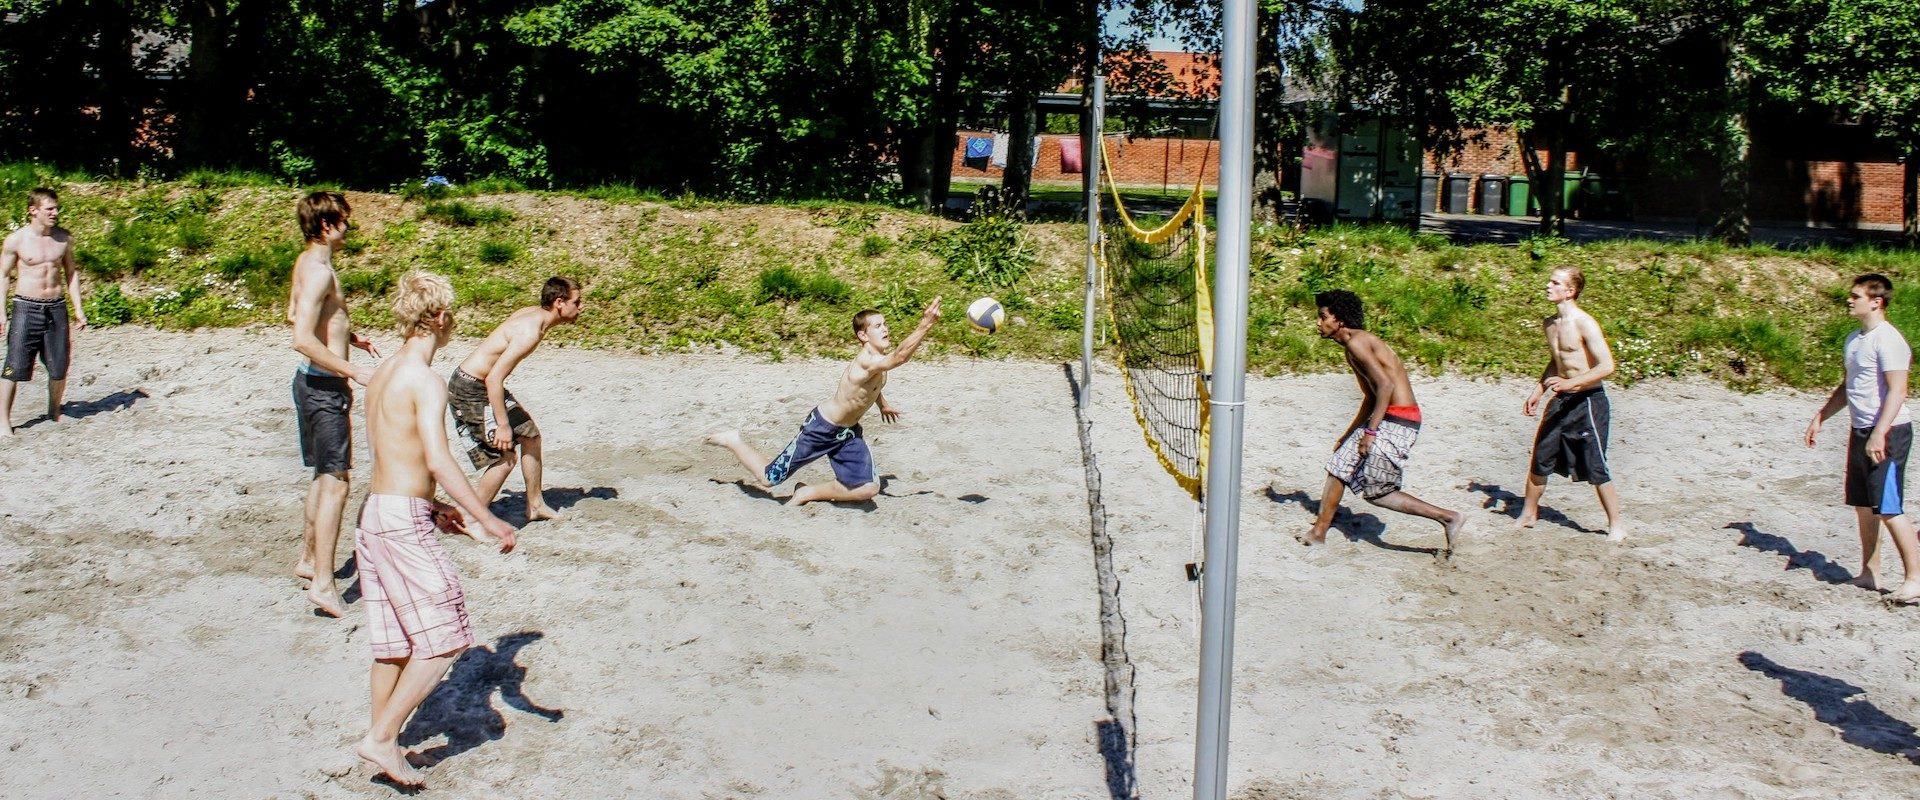 volleyball efterskole